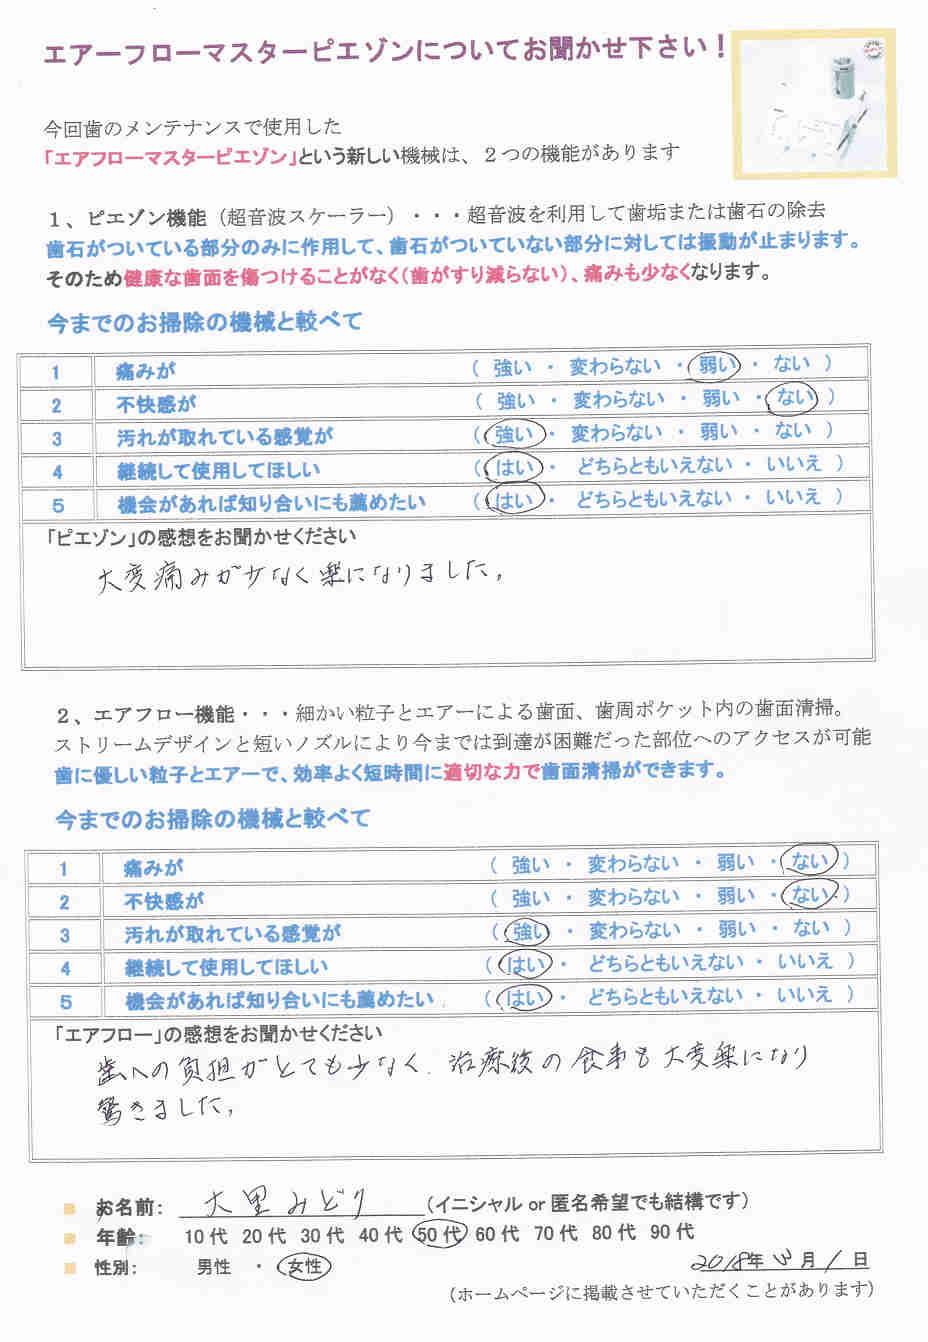 http://www.hayashi-dental.info/oosato.jpg